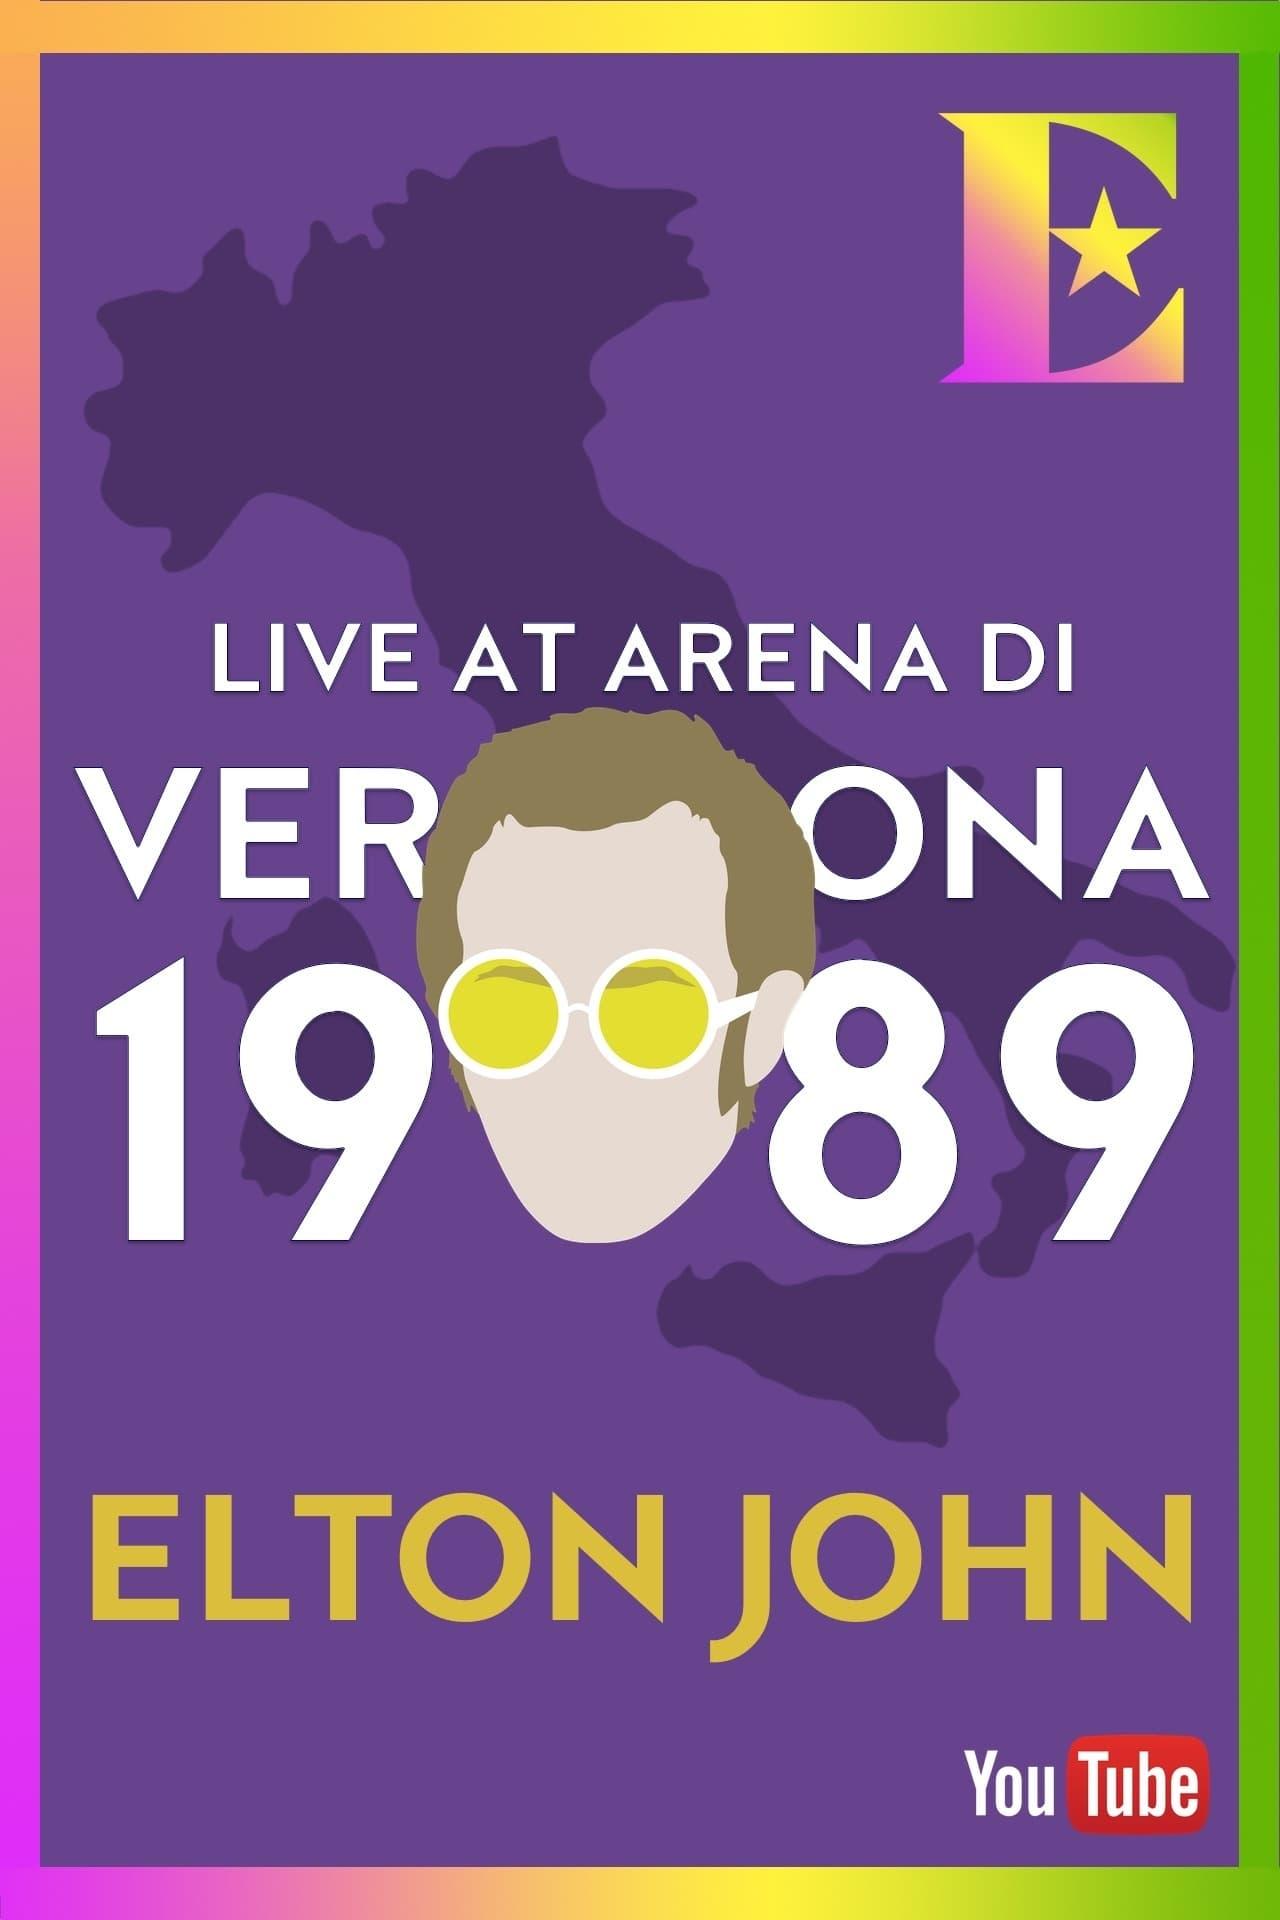 Elton John - Arena di Verona, Italy